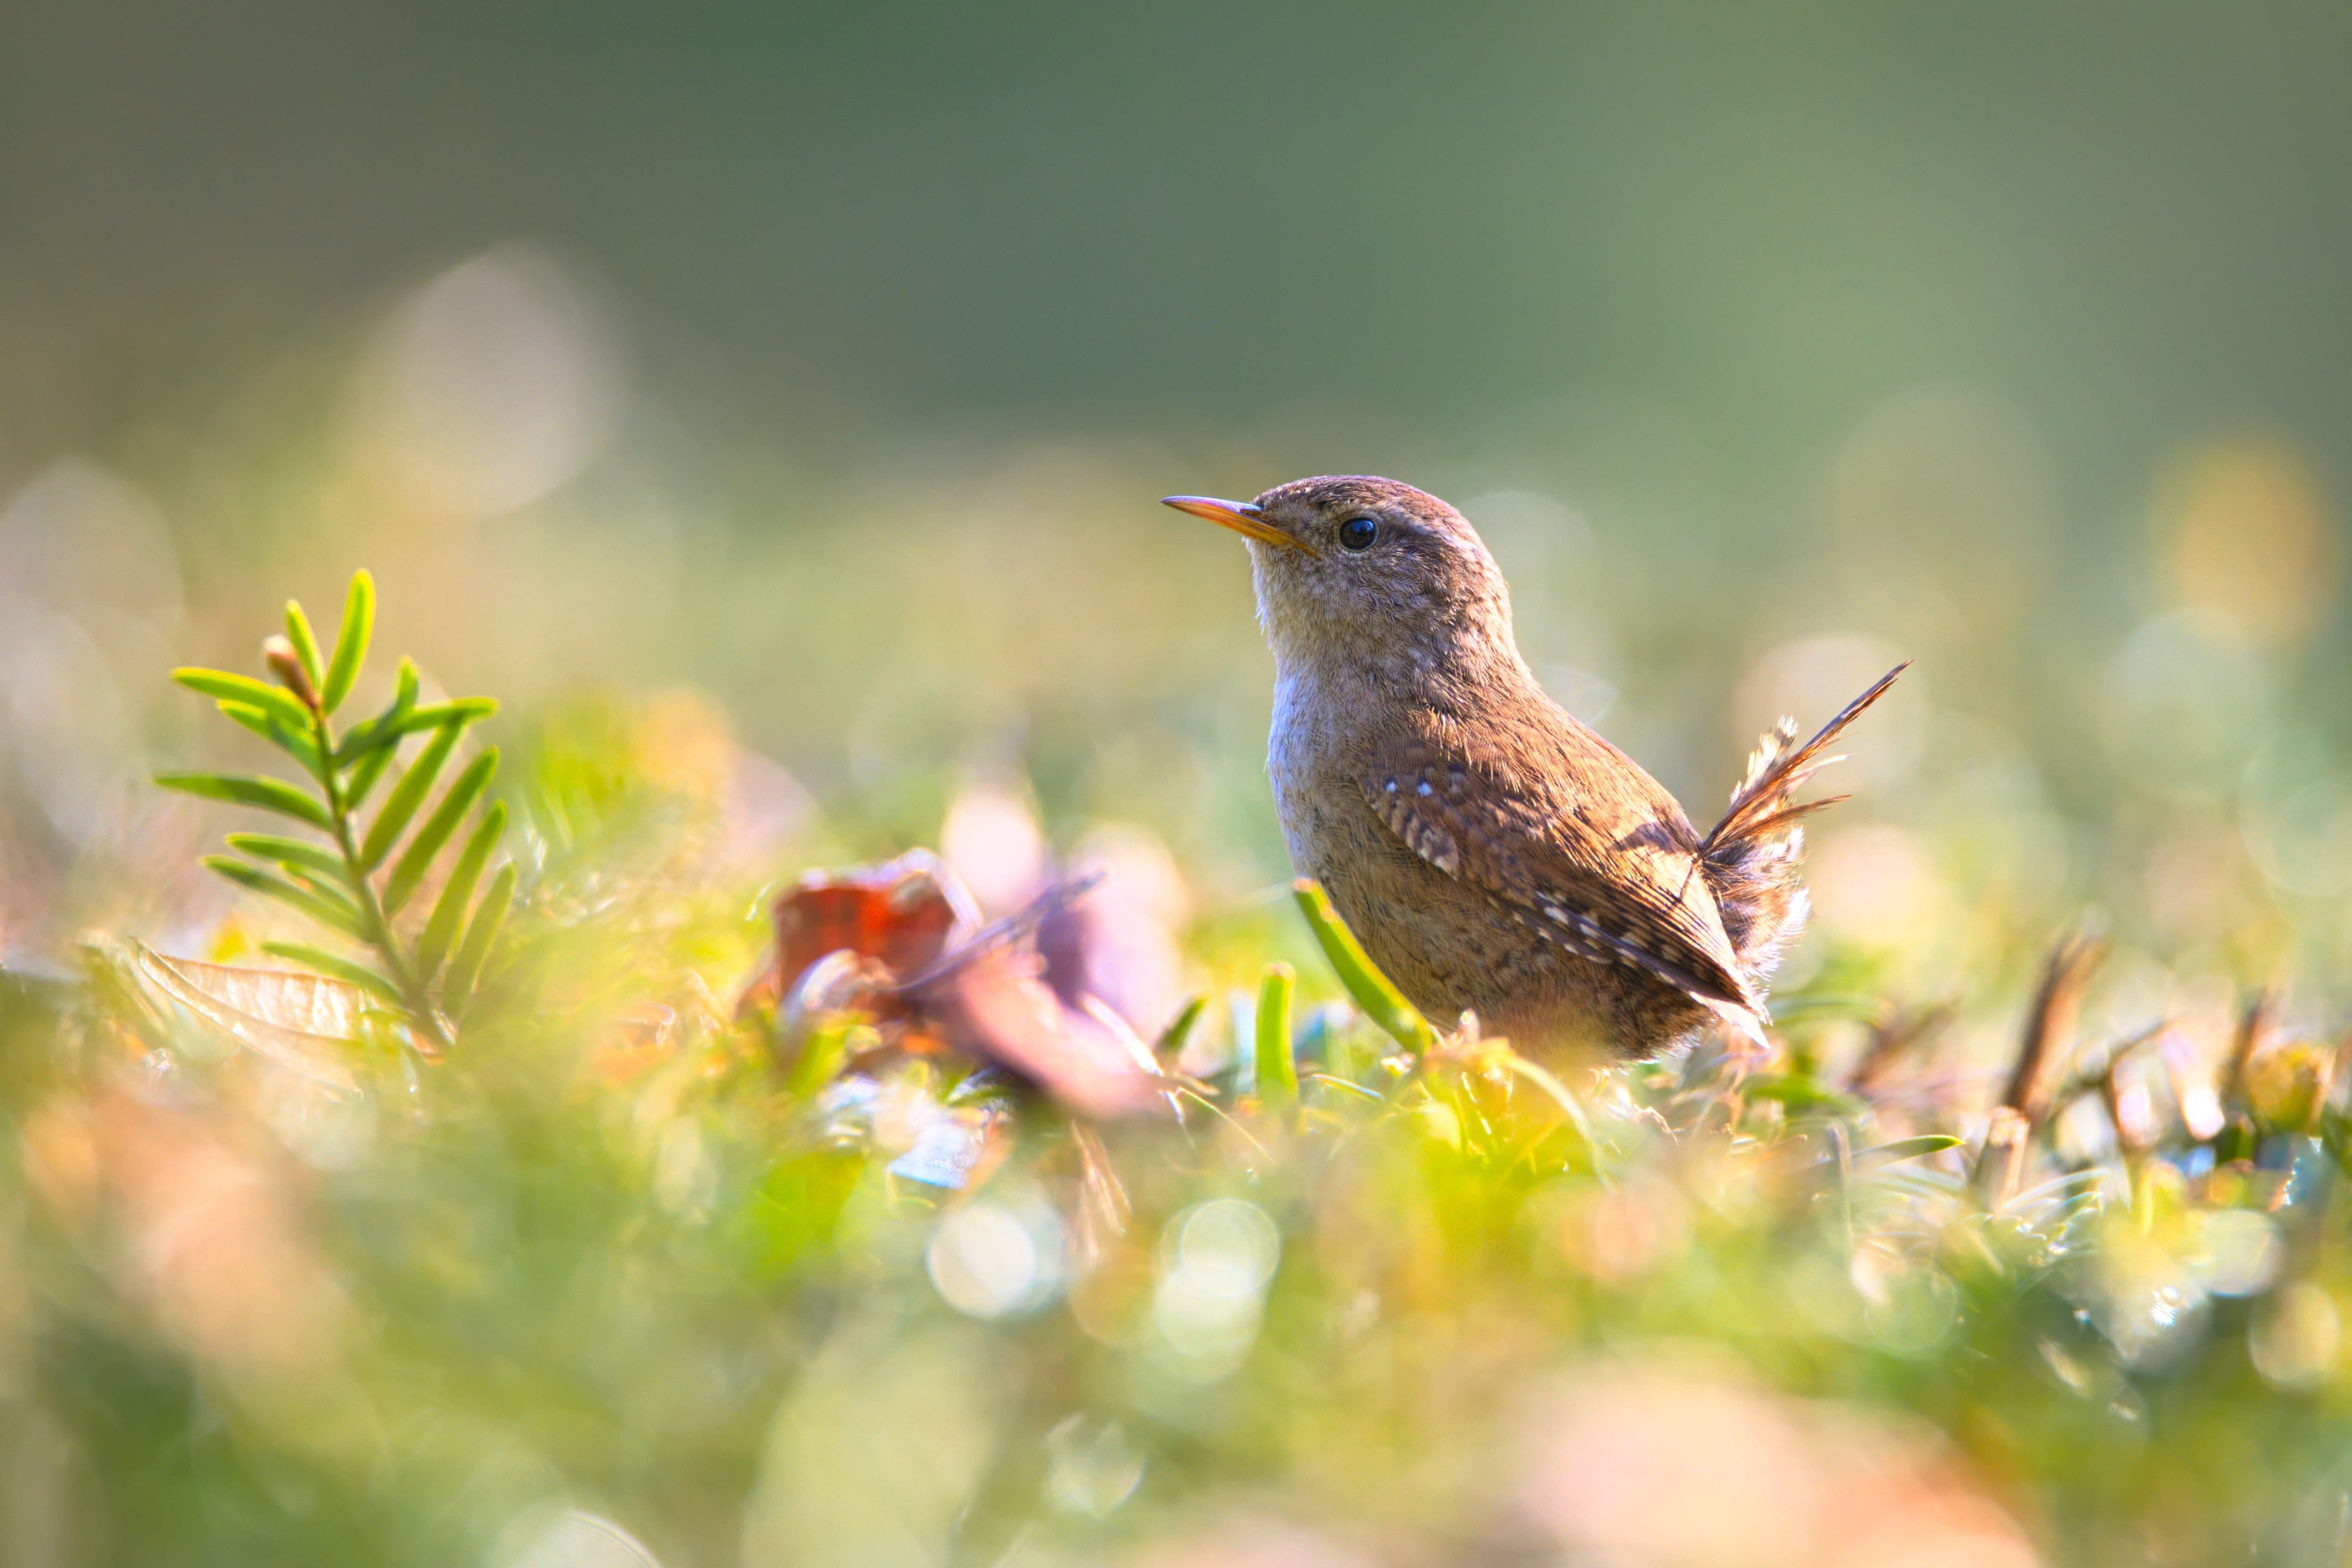 Brown Bird on Green Plant